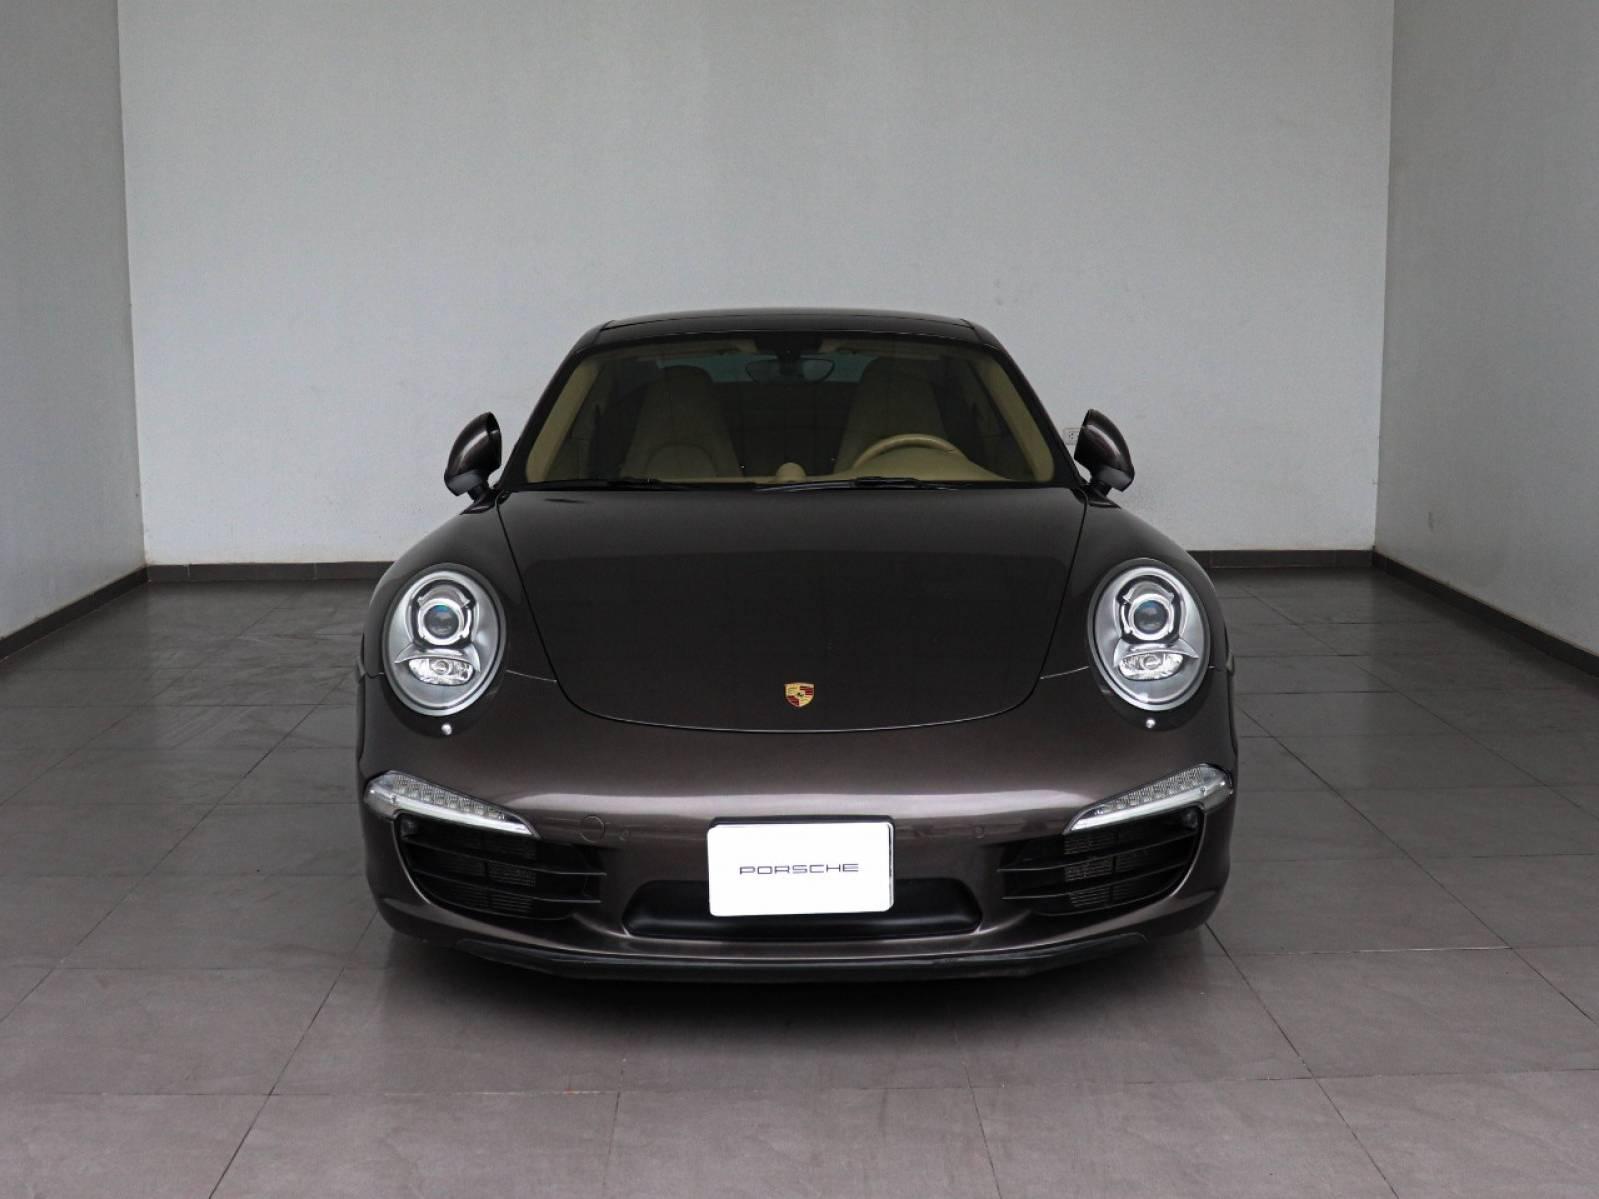 2013 Porsche 911 Carrera S – 5